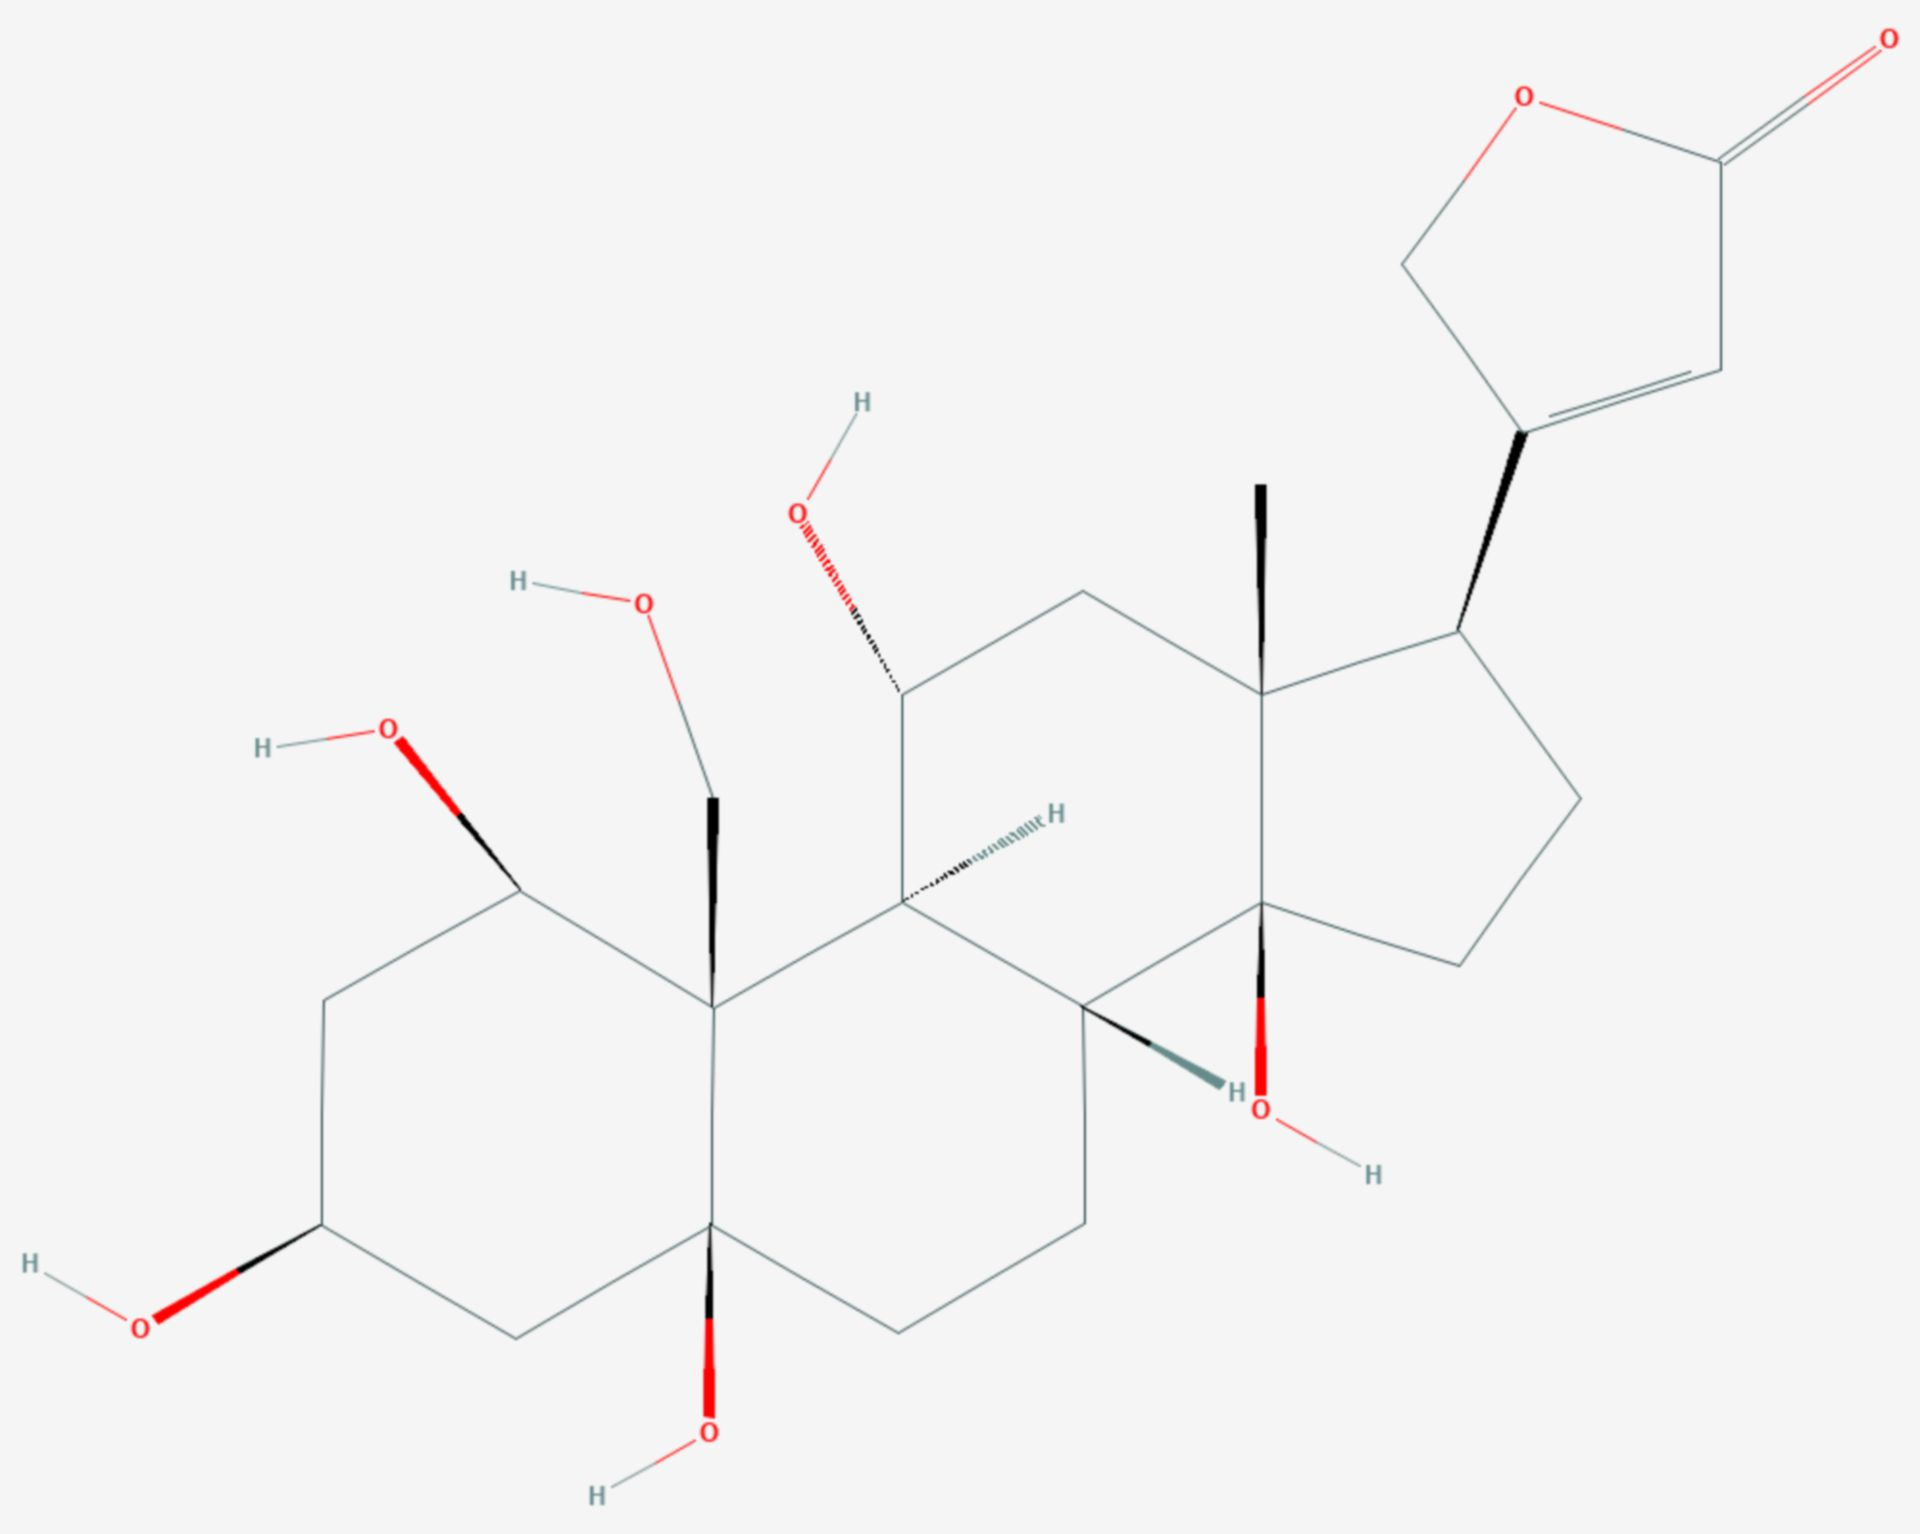 Ouabagenin (Strukturformel)